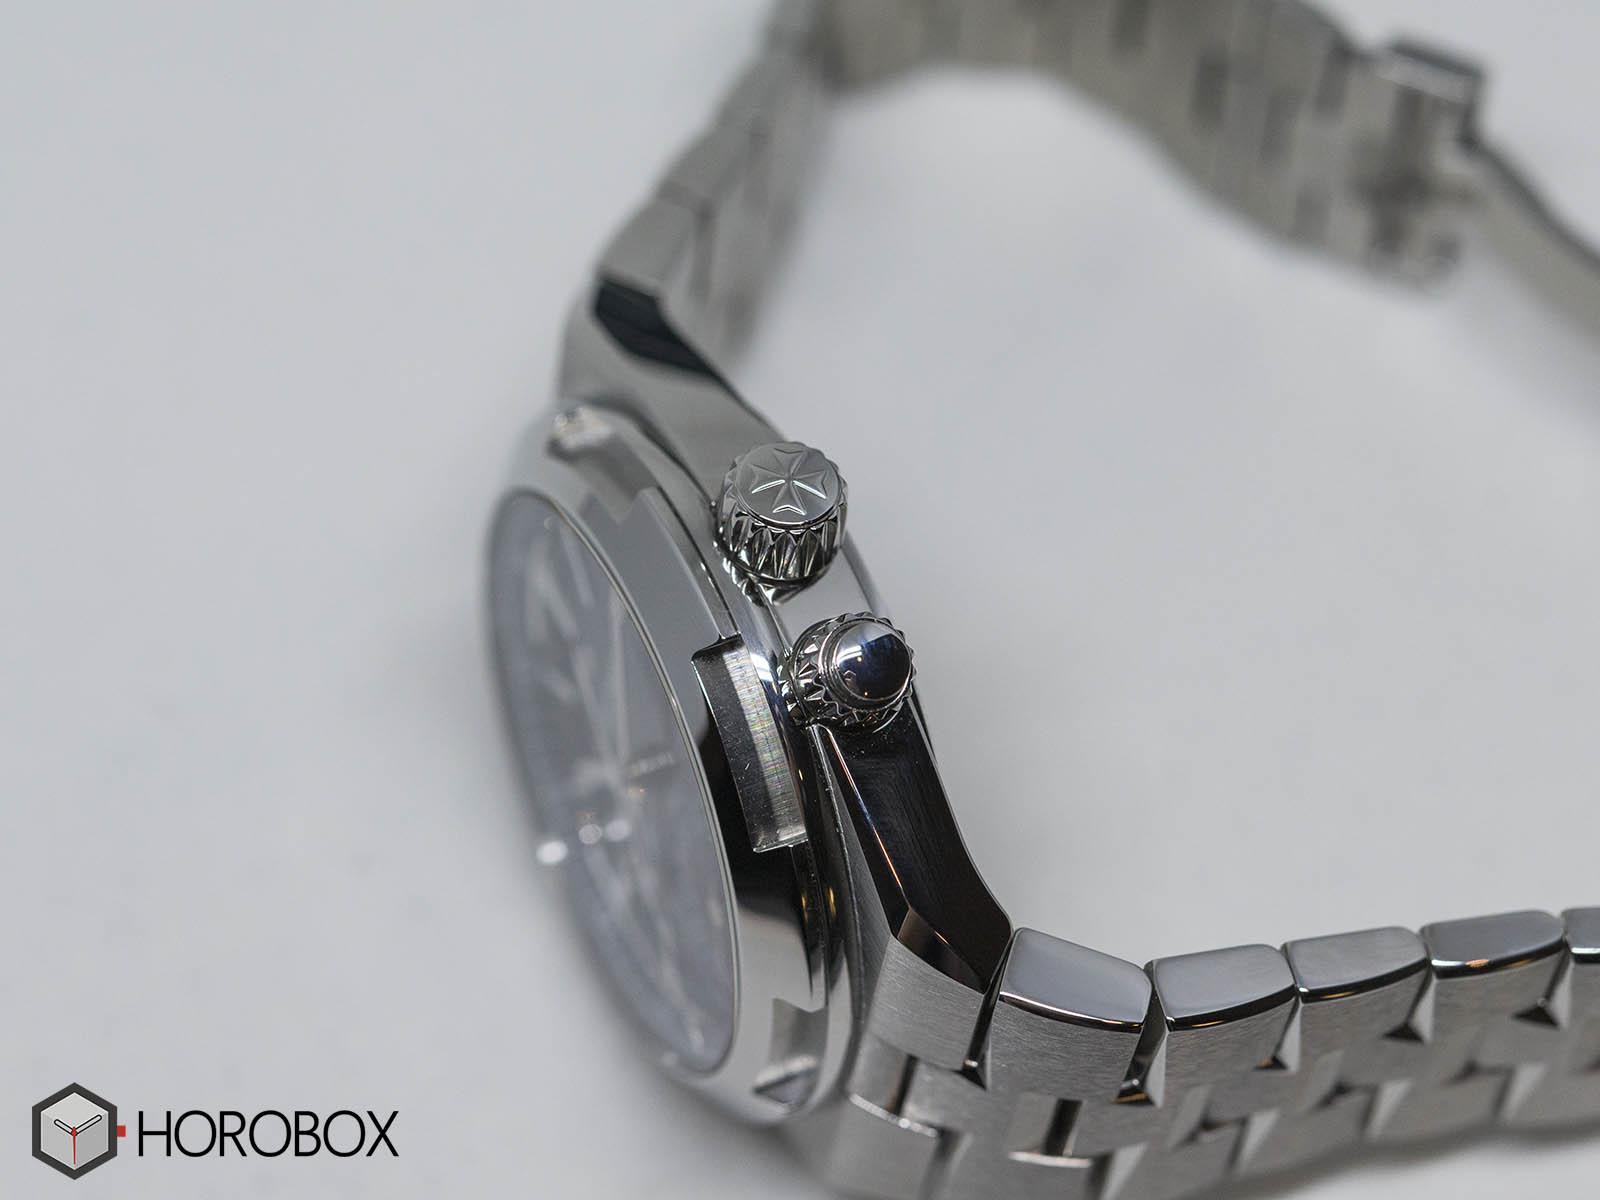 7900v110a-b334-Vacheron-Constantin-Overseas-Dual-Time-Sihh-2018-4.jpg